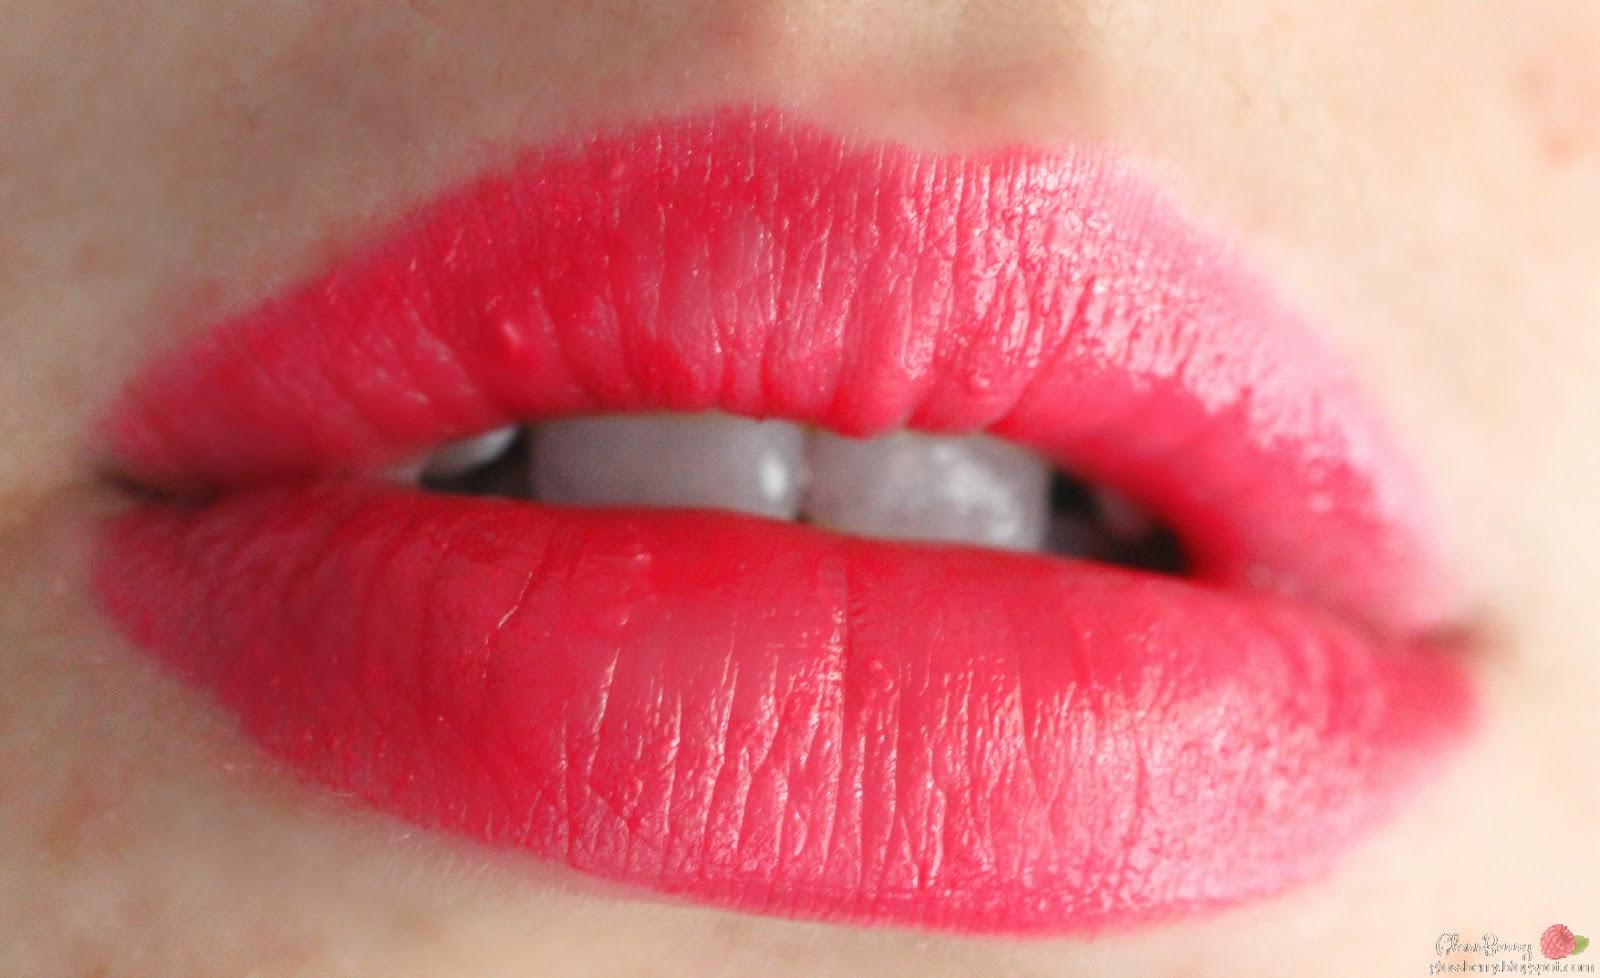 Revlon - Colorburst Lacquer Balm - Vivacious review swatches 120 סקירה שפתון באלם צ'אבי רבלון ורוד גלוסברי